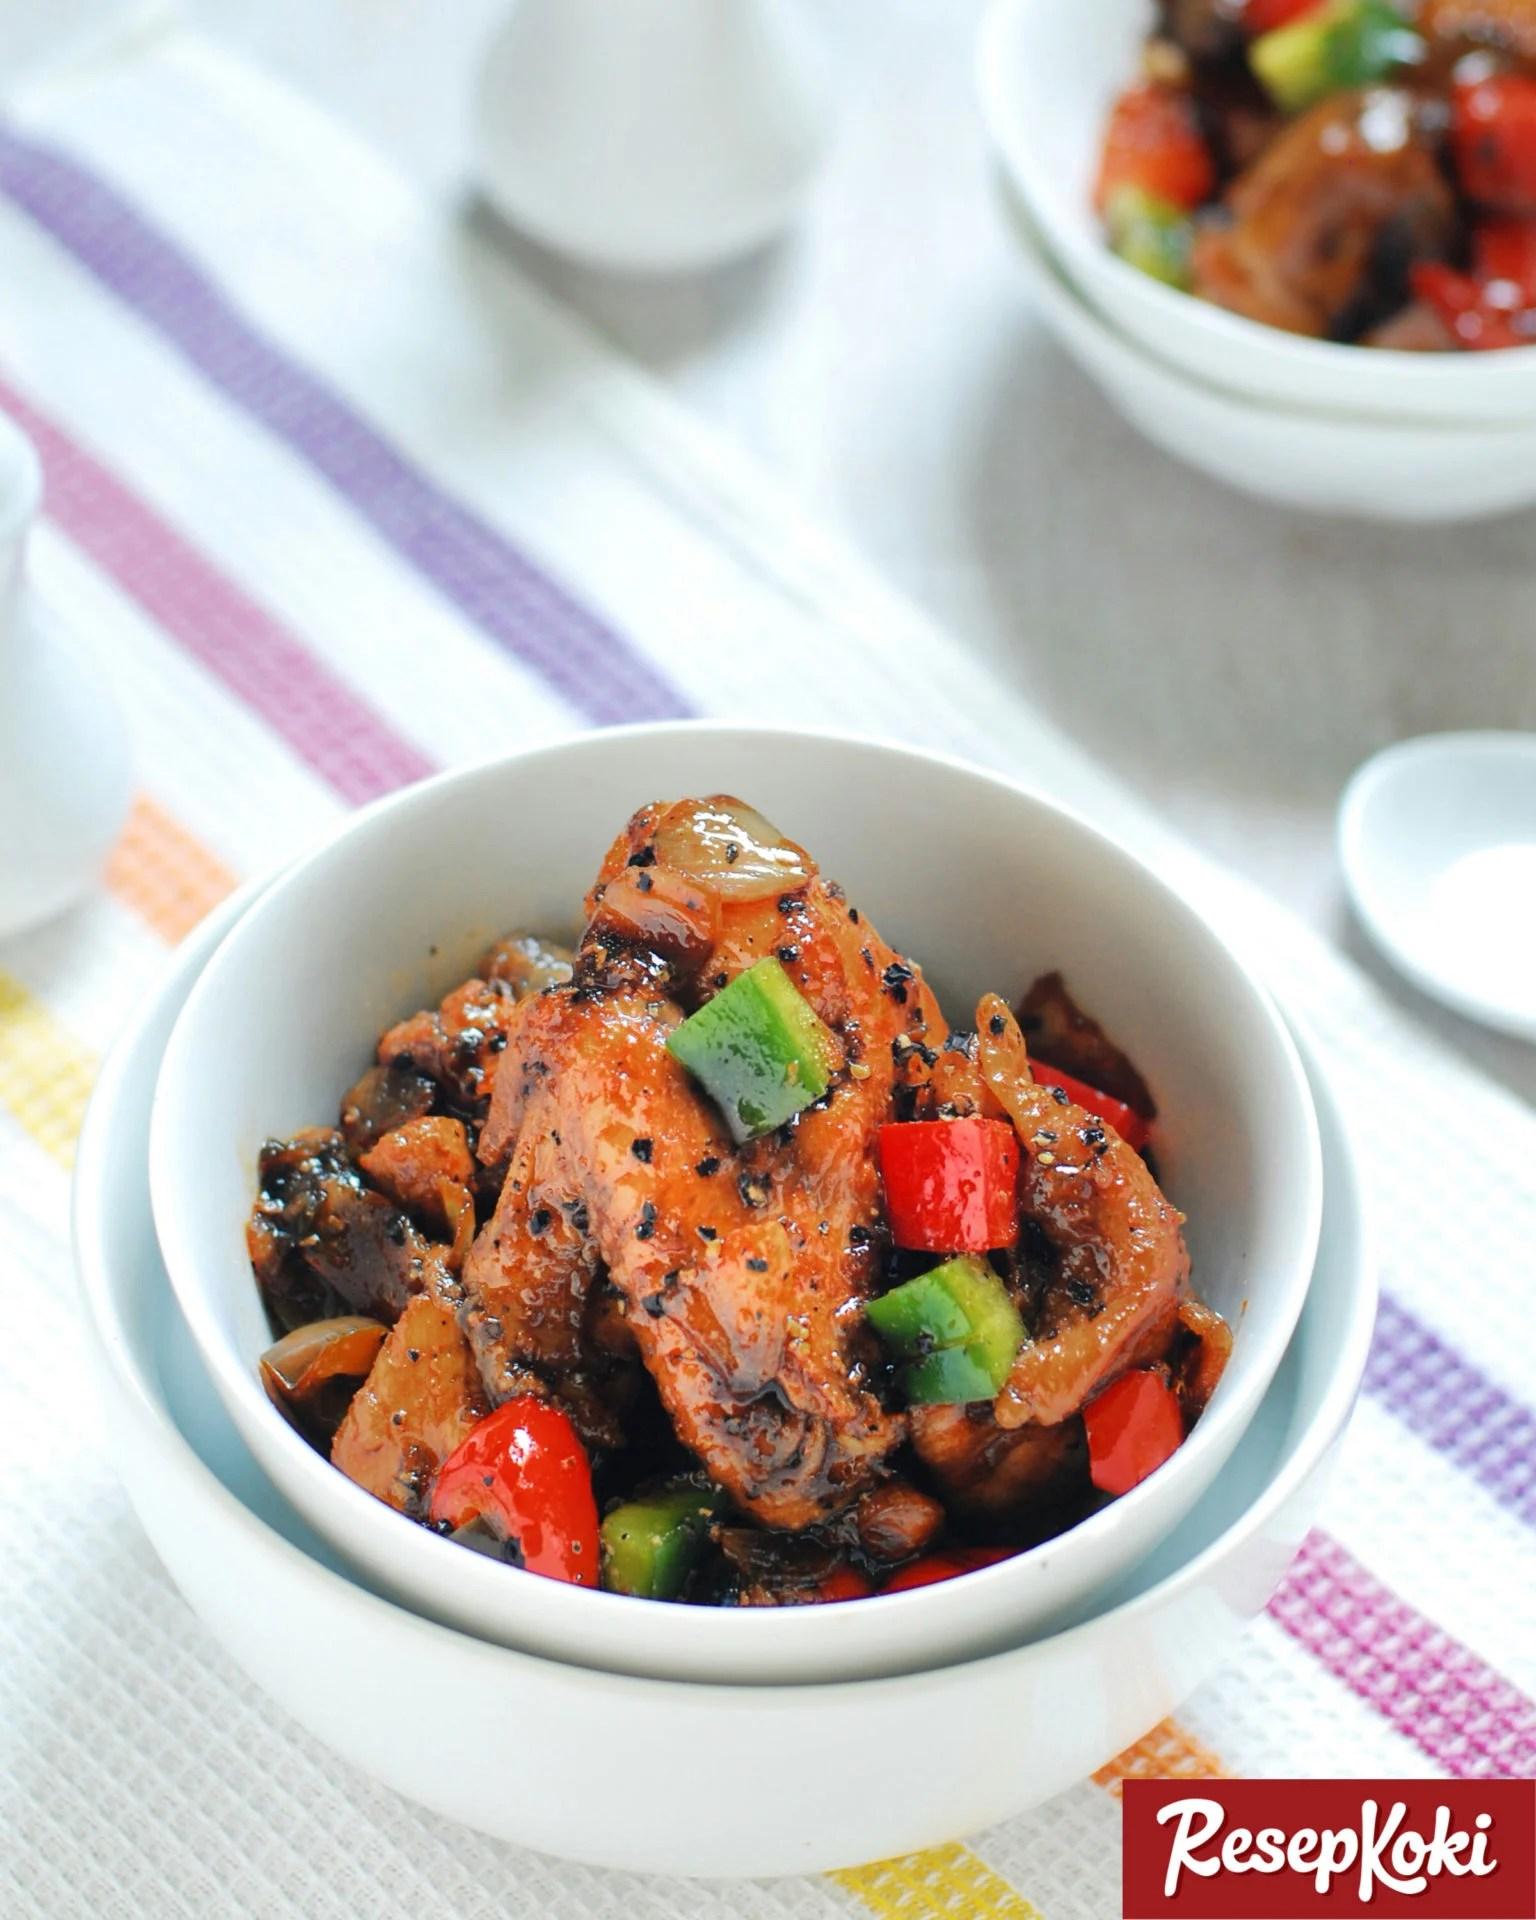 Resep Ayam Lada Hitam : resep, hitam, Hitam, Pedas, Istimewa, Resep, ResepKoki